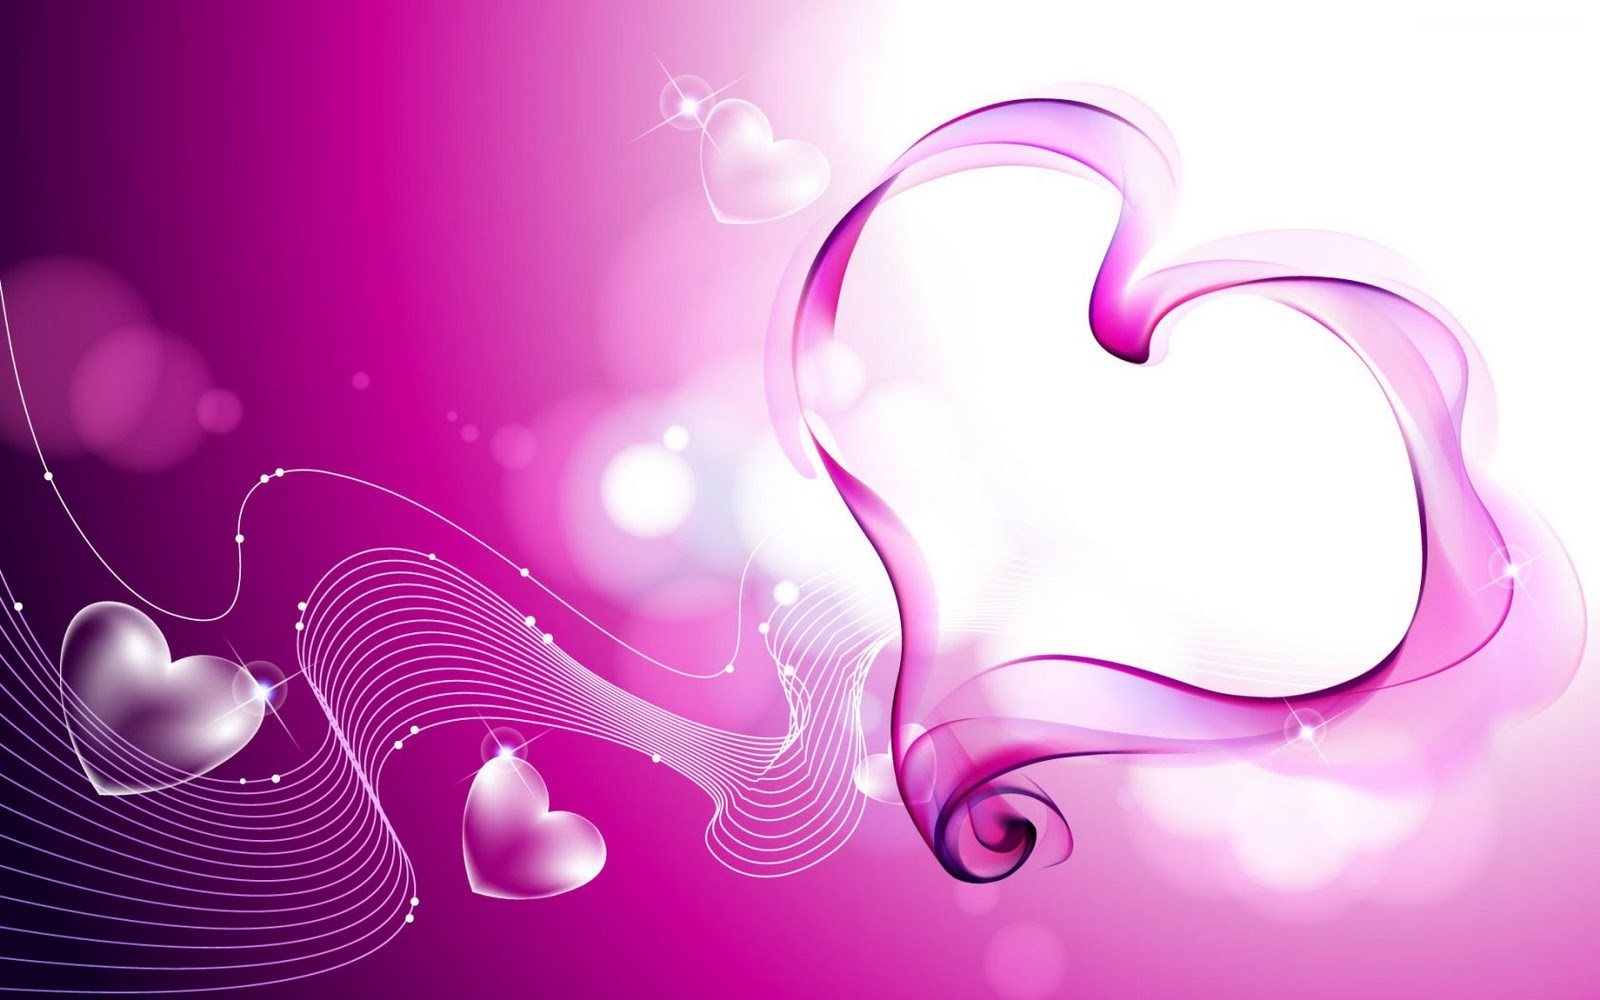 Love wallpapers hd amor fondos de pantalla love 3d - Love wallpaper photo gallery ...